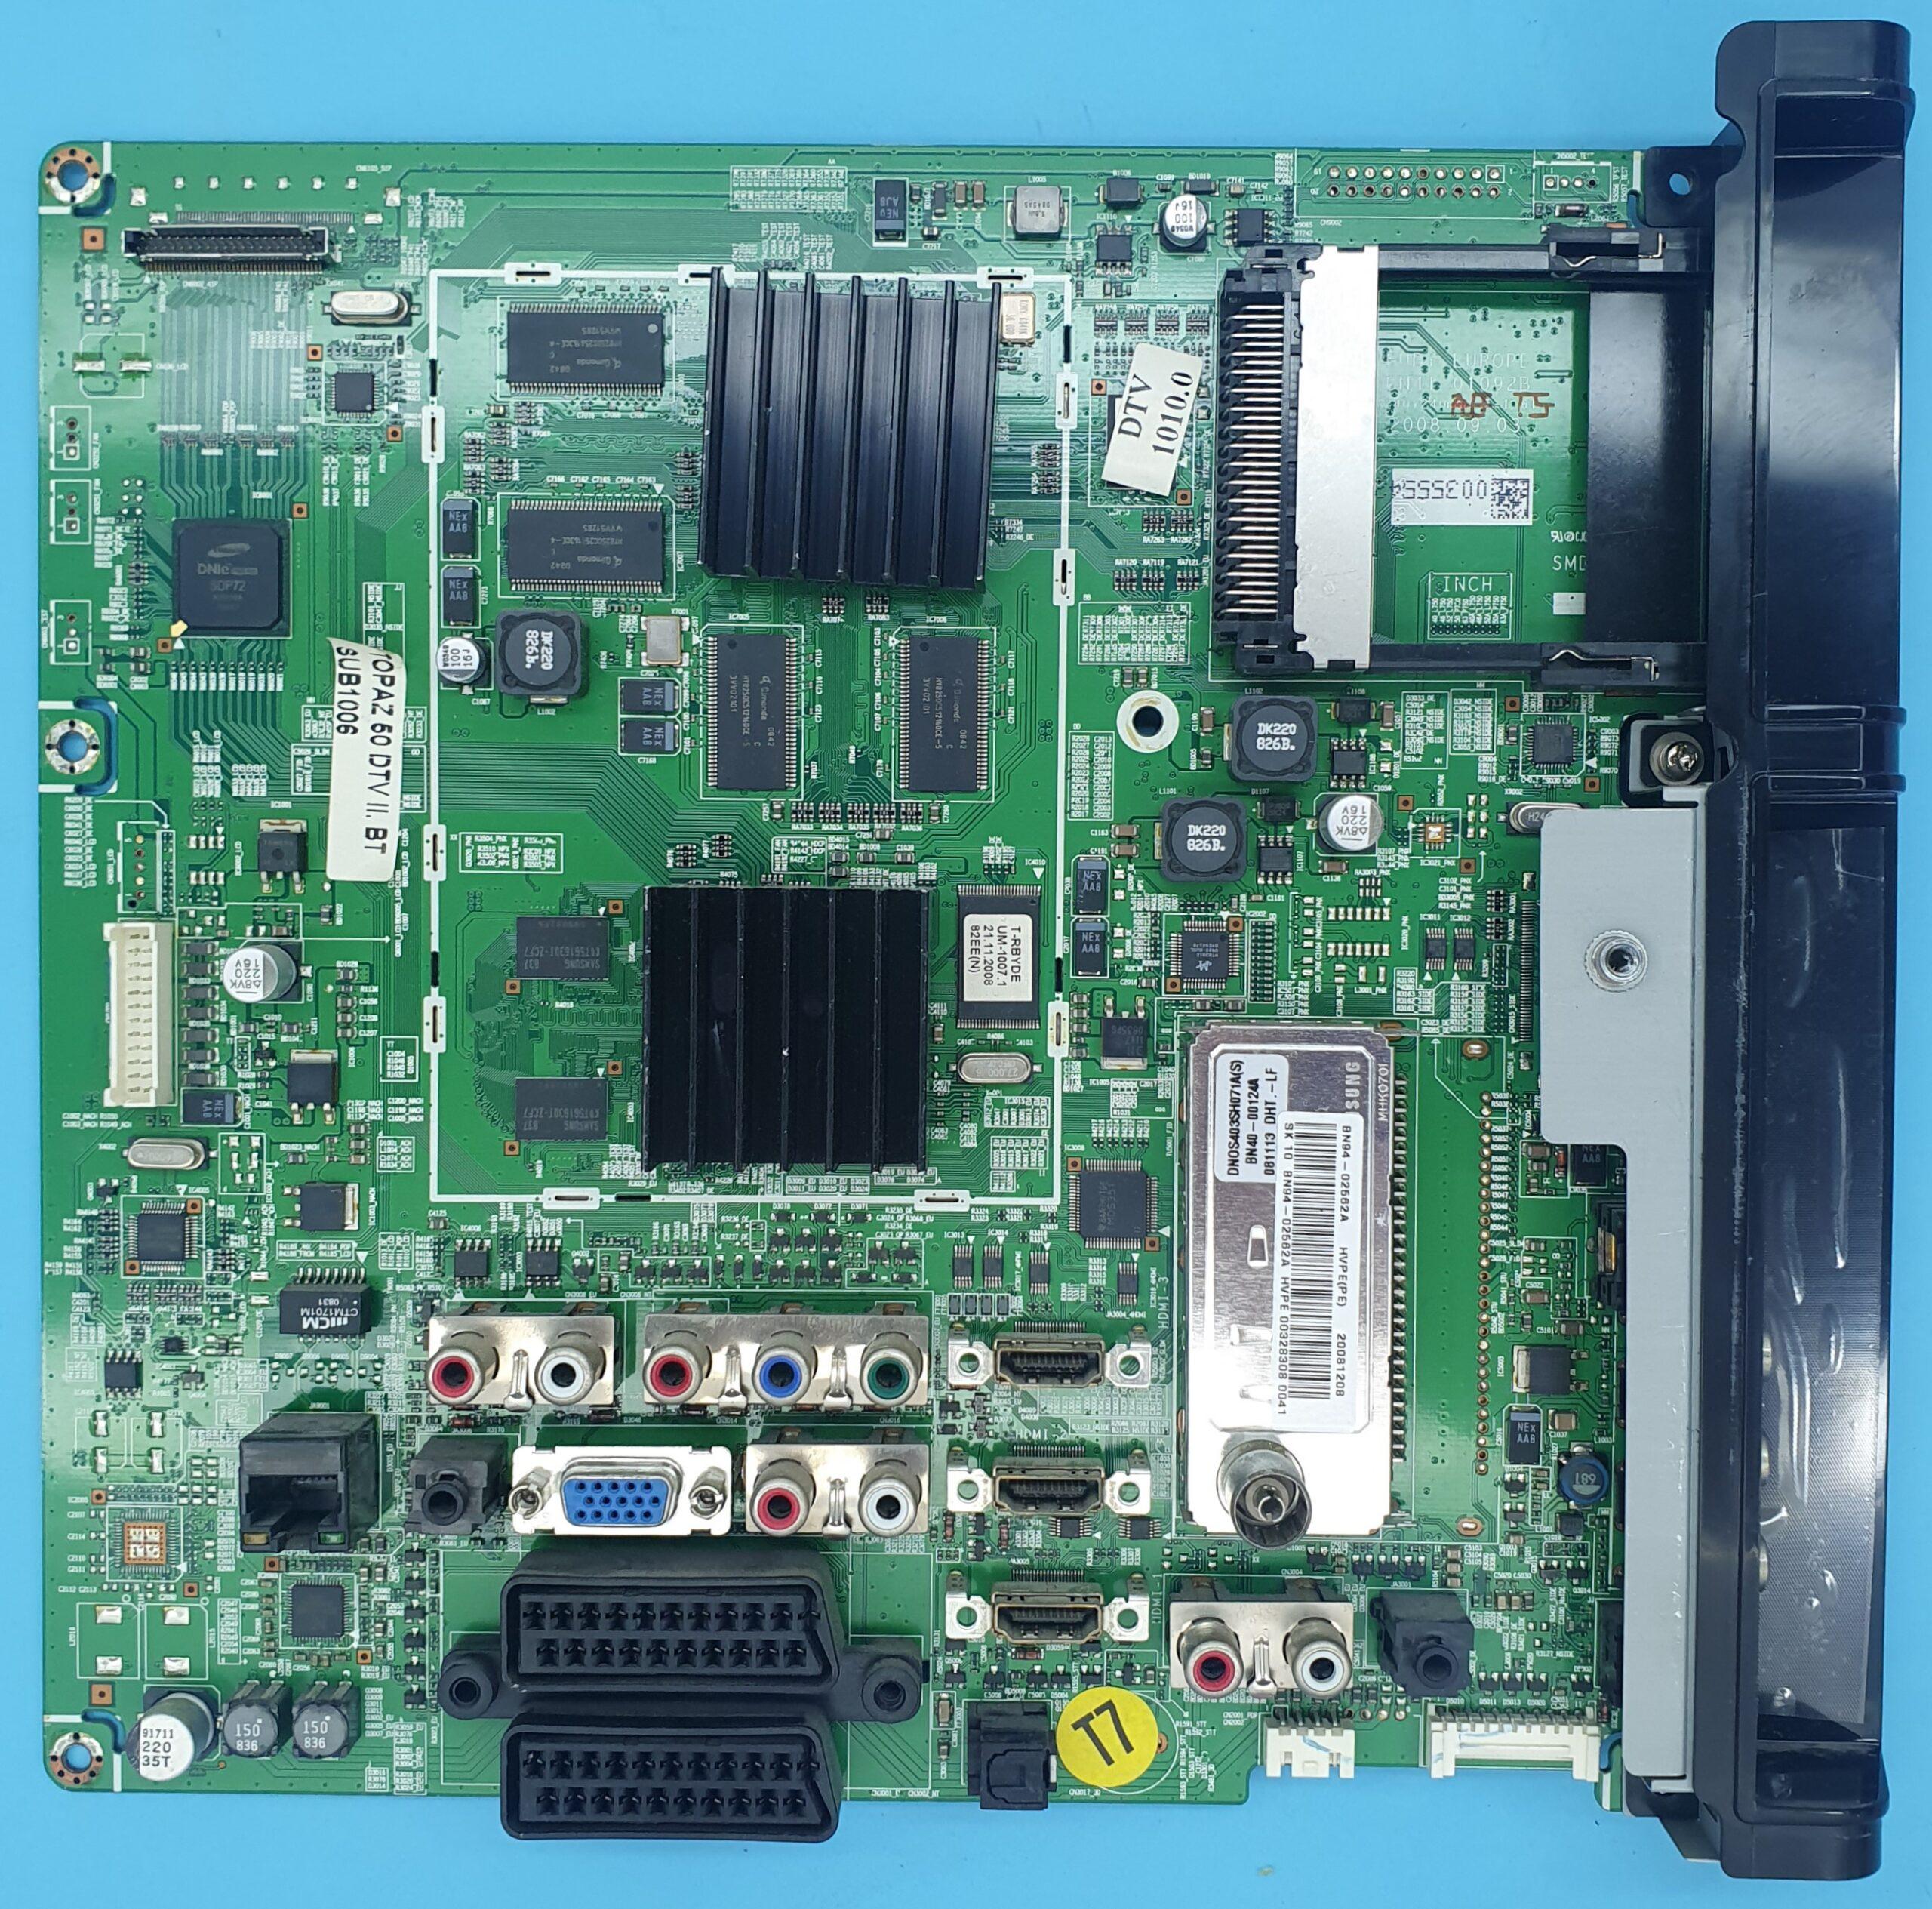 BN94-02662A Samsung Anakart (KDV DAHİL = 350 TL)